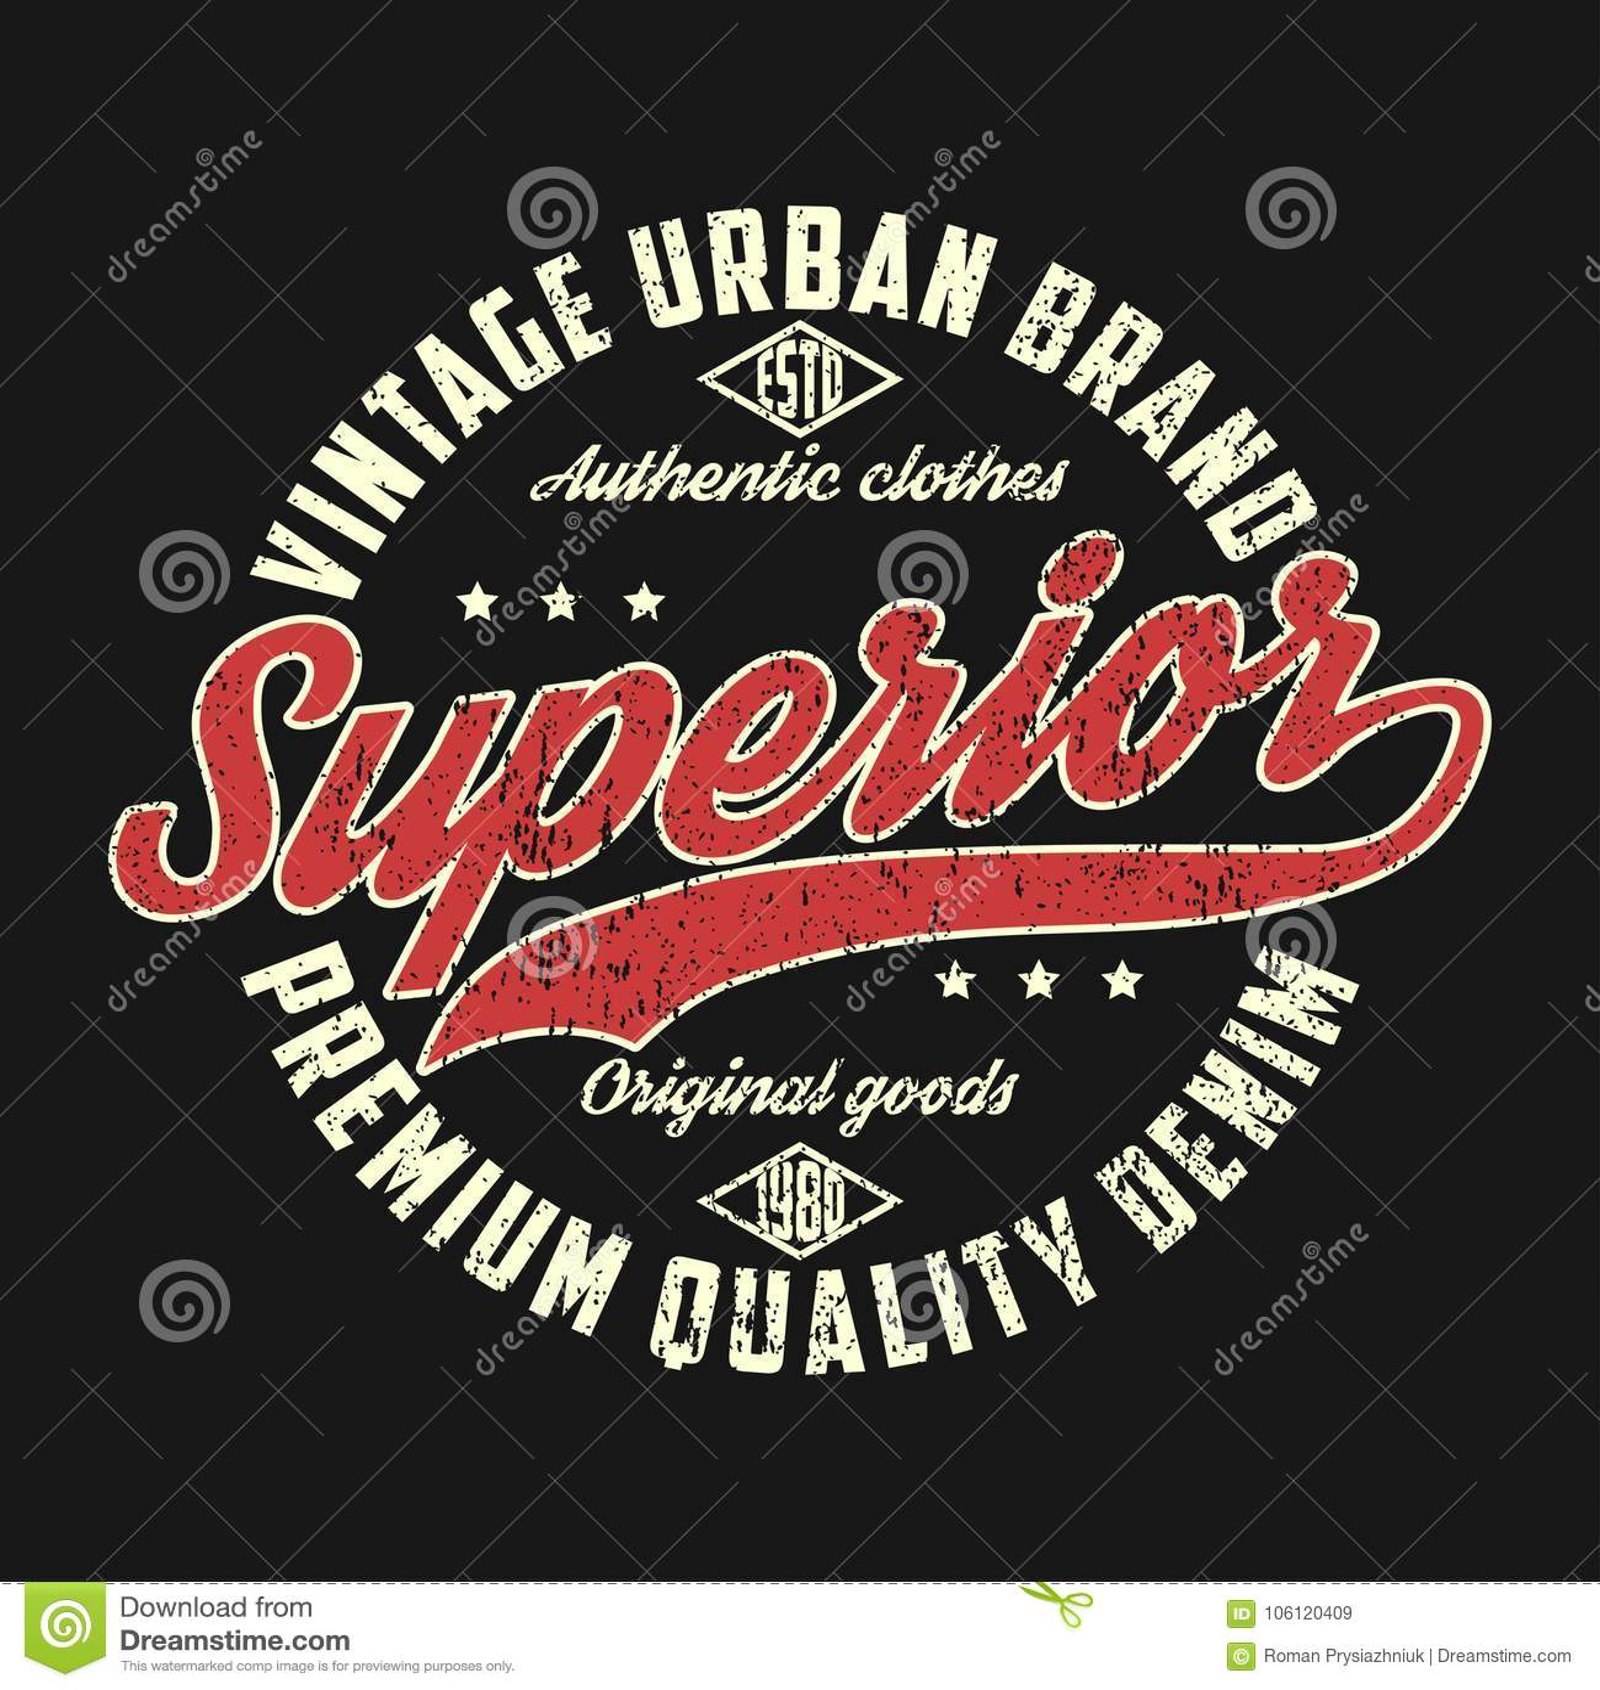 Sarja de Nimes superior, gráfico urbano do tipo do vintage para o t-shirt